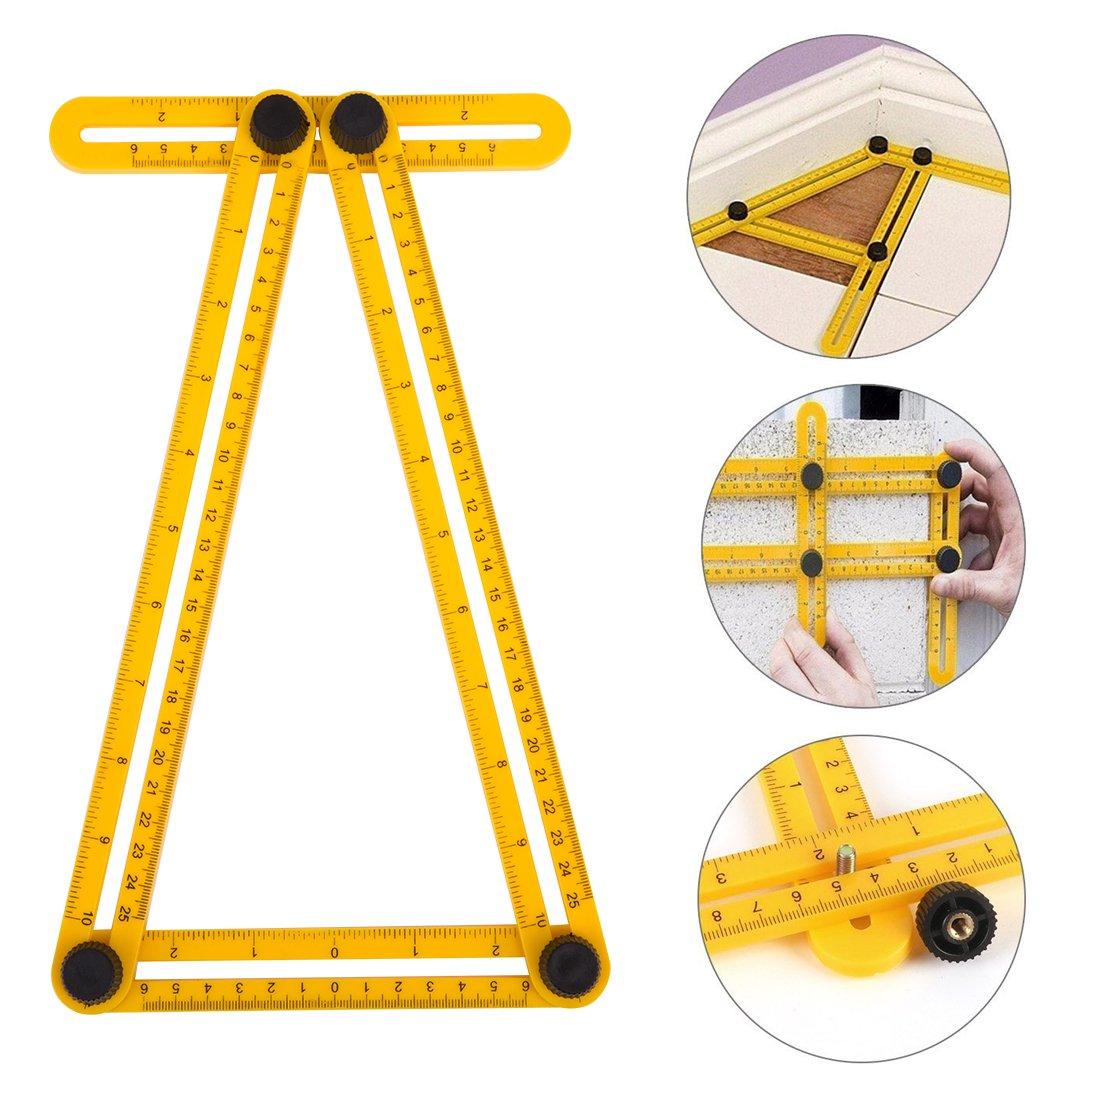 Handsaws Set, Four Fold Ruler, Multifunction Bow Saw +Angle Measuring Ruler for Engineer Handymen Builders Craftsmen by SILIVN by SILIVN (Image #4)